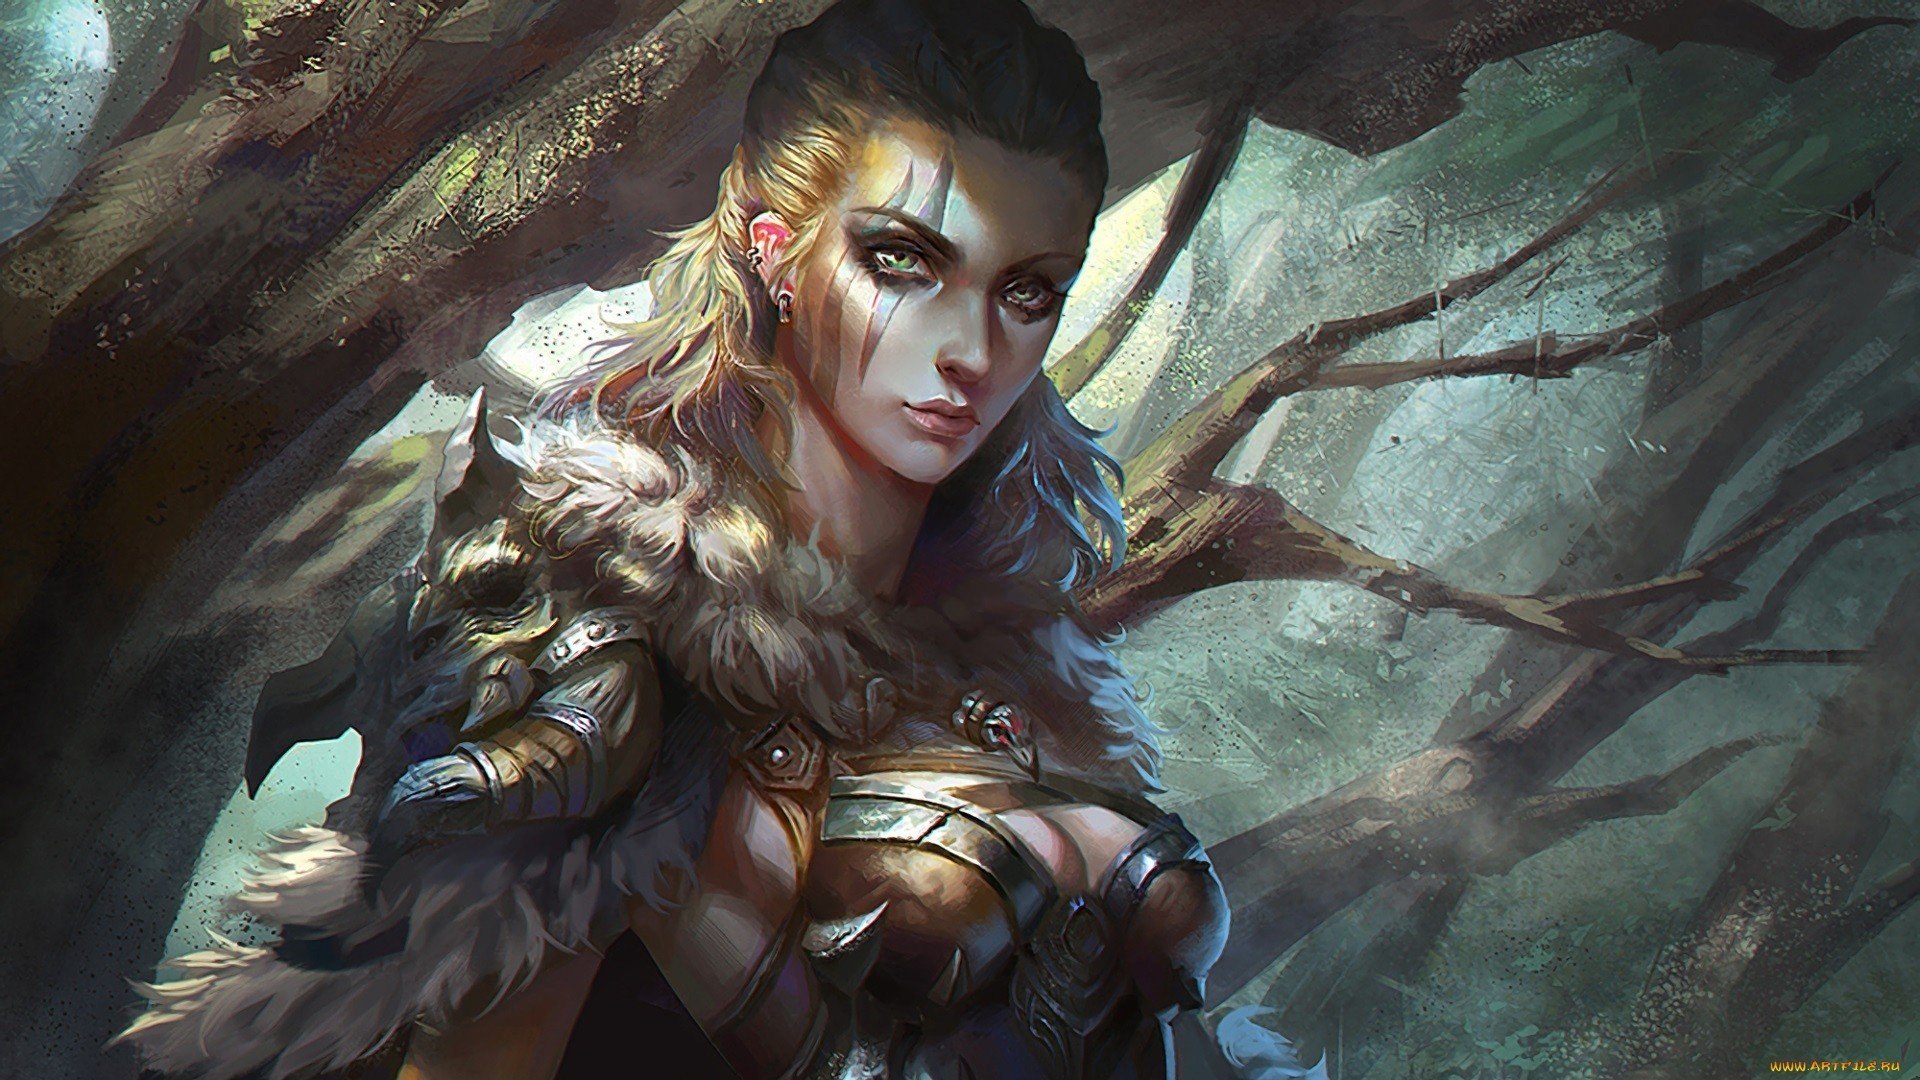 Fantasy Art Fantasy Girl Hd Wallpapers Desktop And Mobile